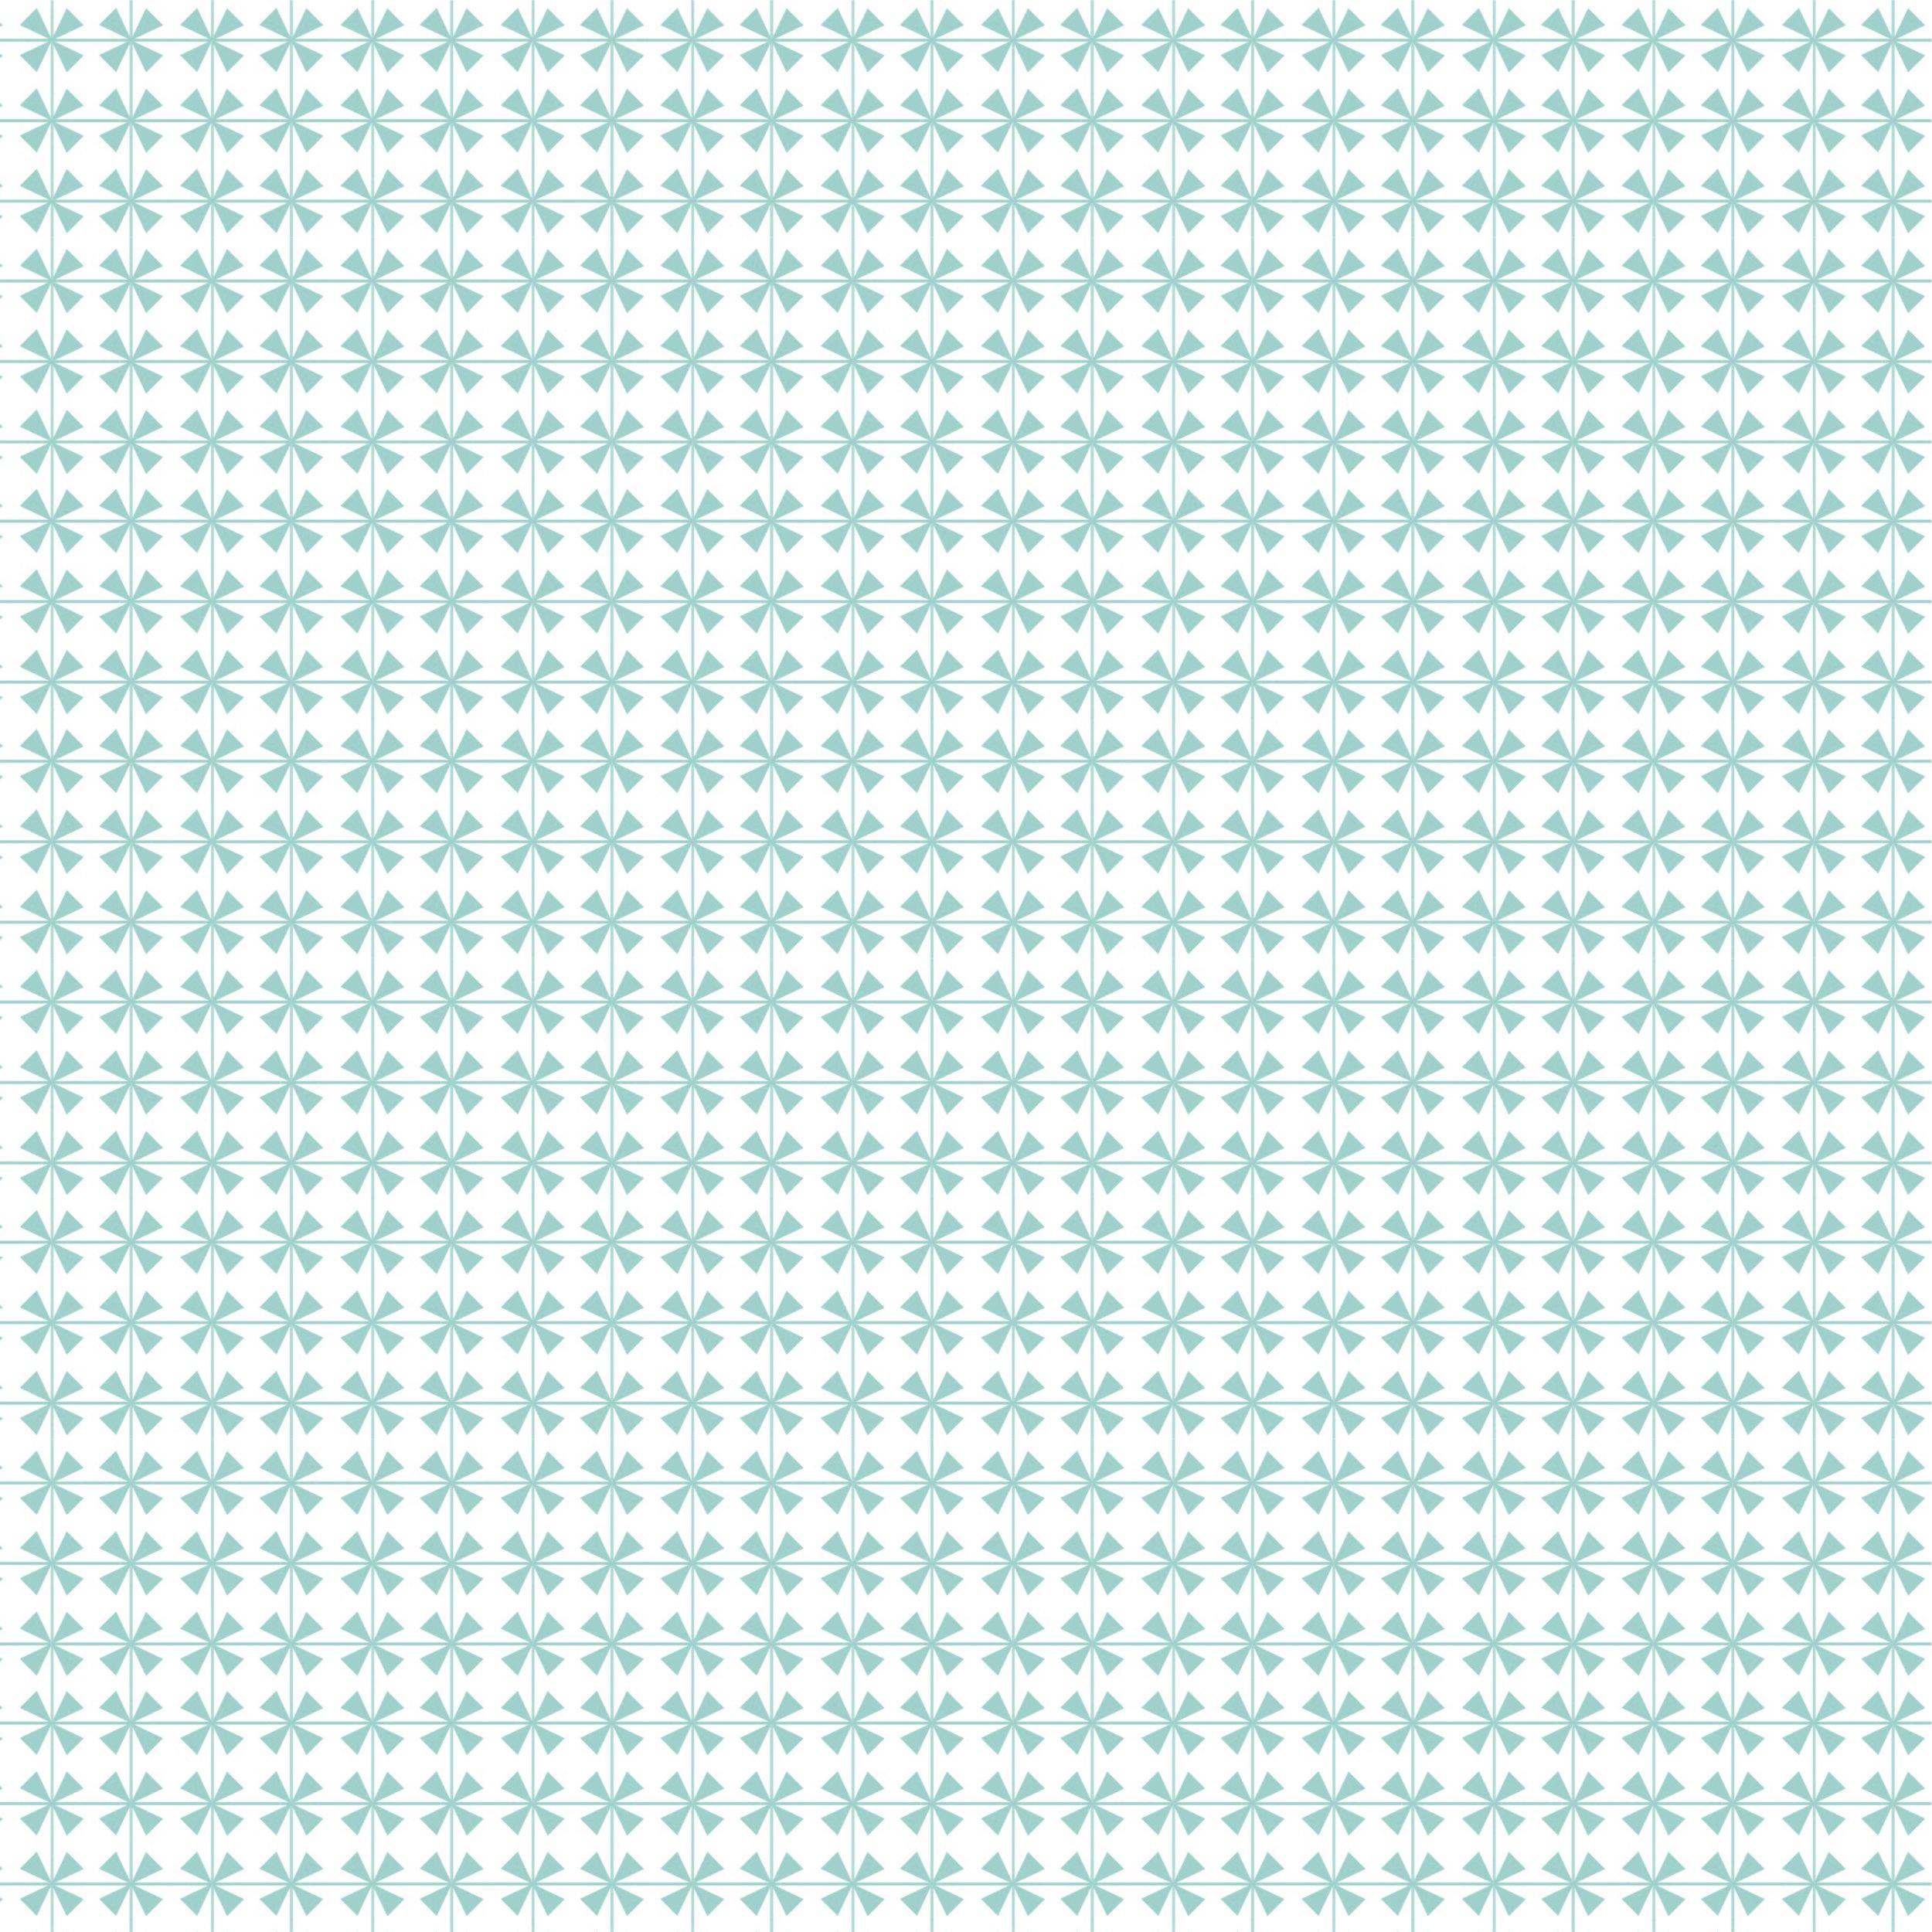 patterns for texas-07.jpg